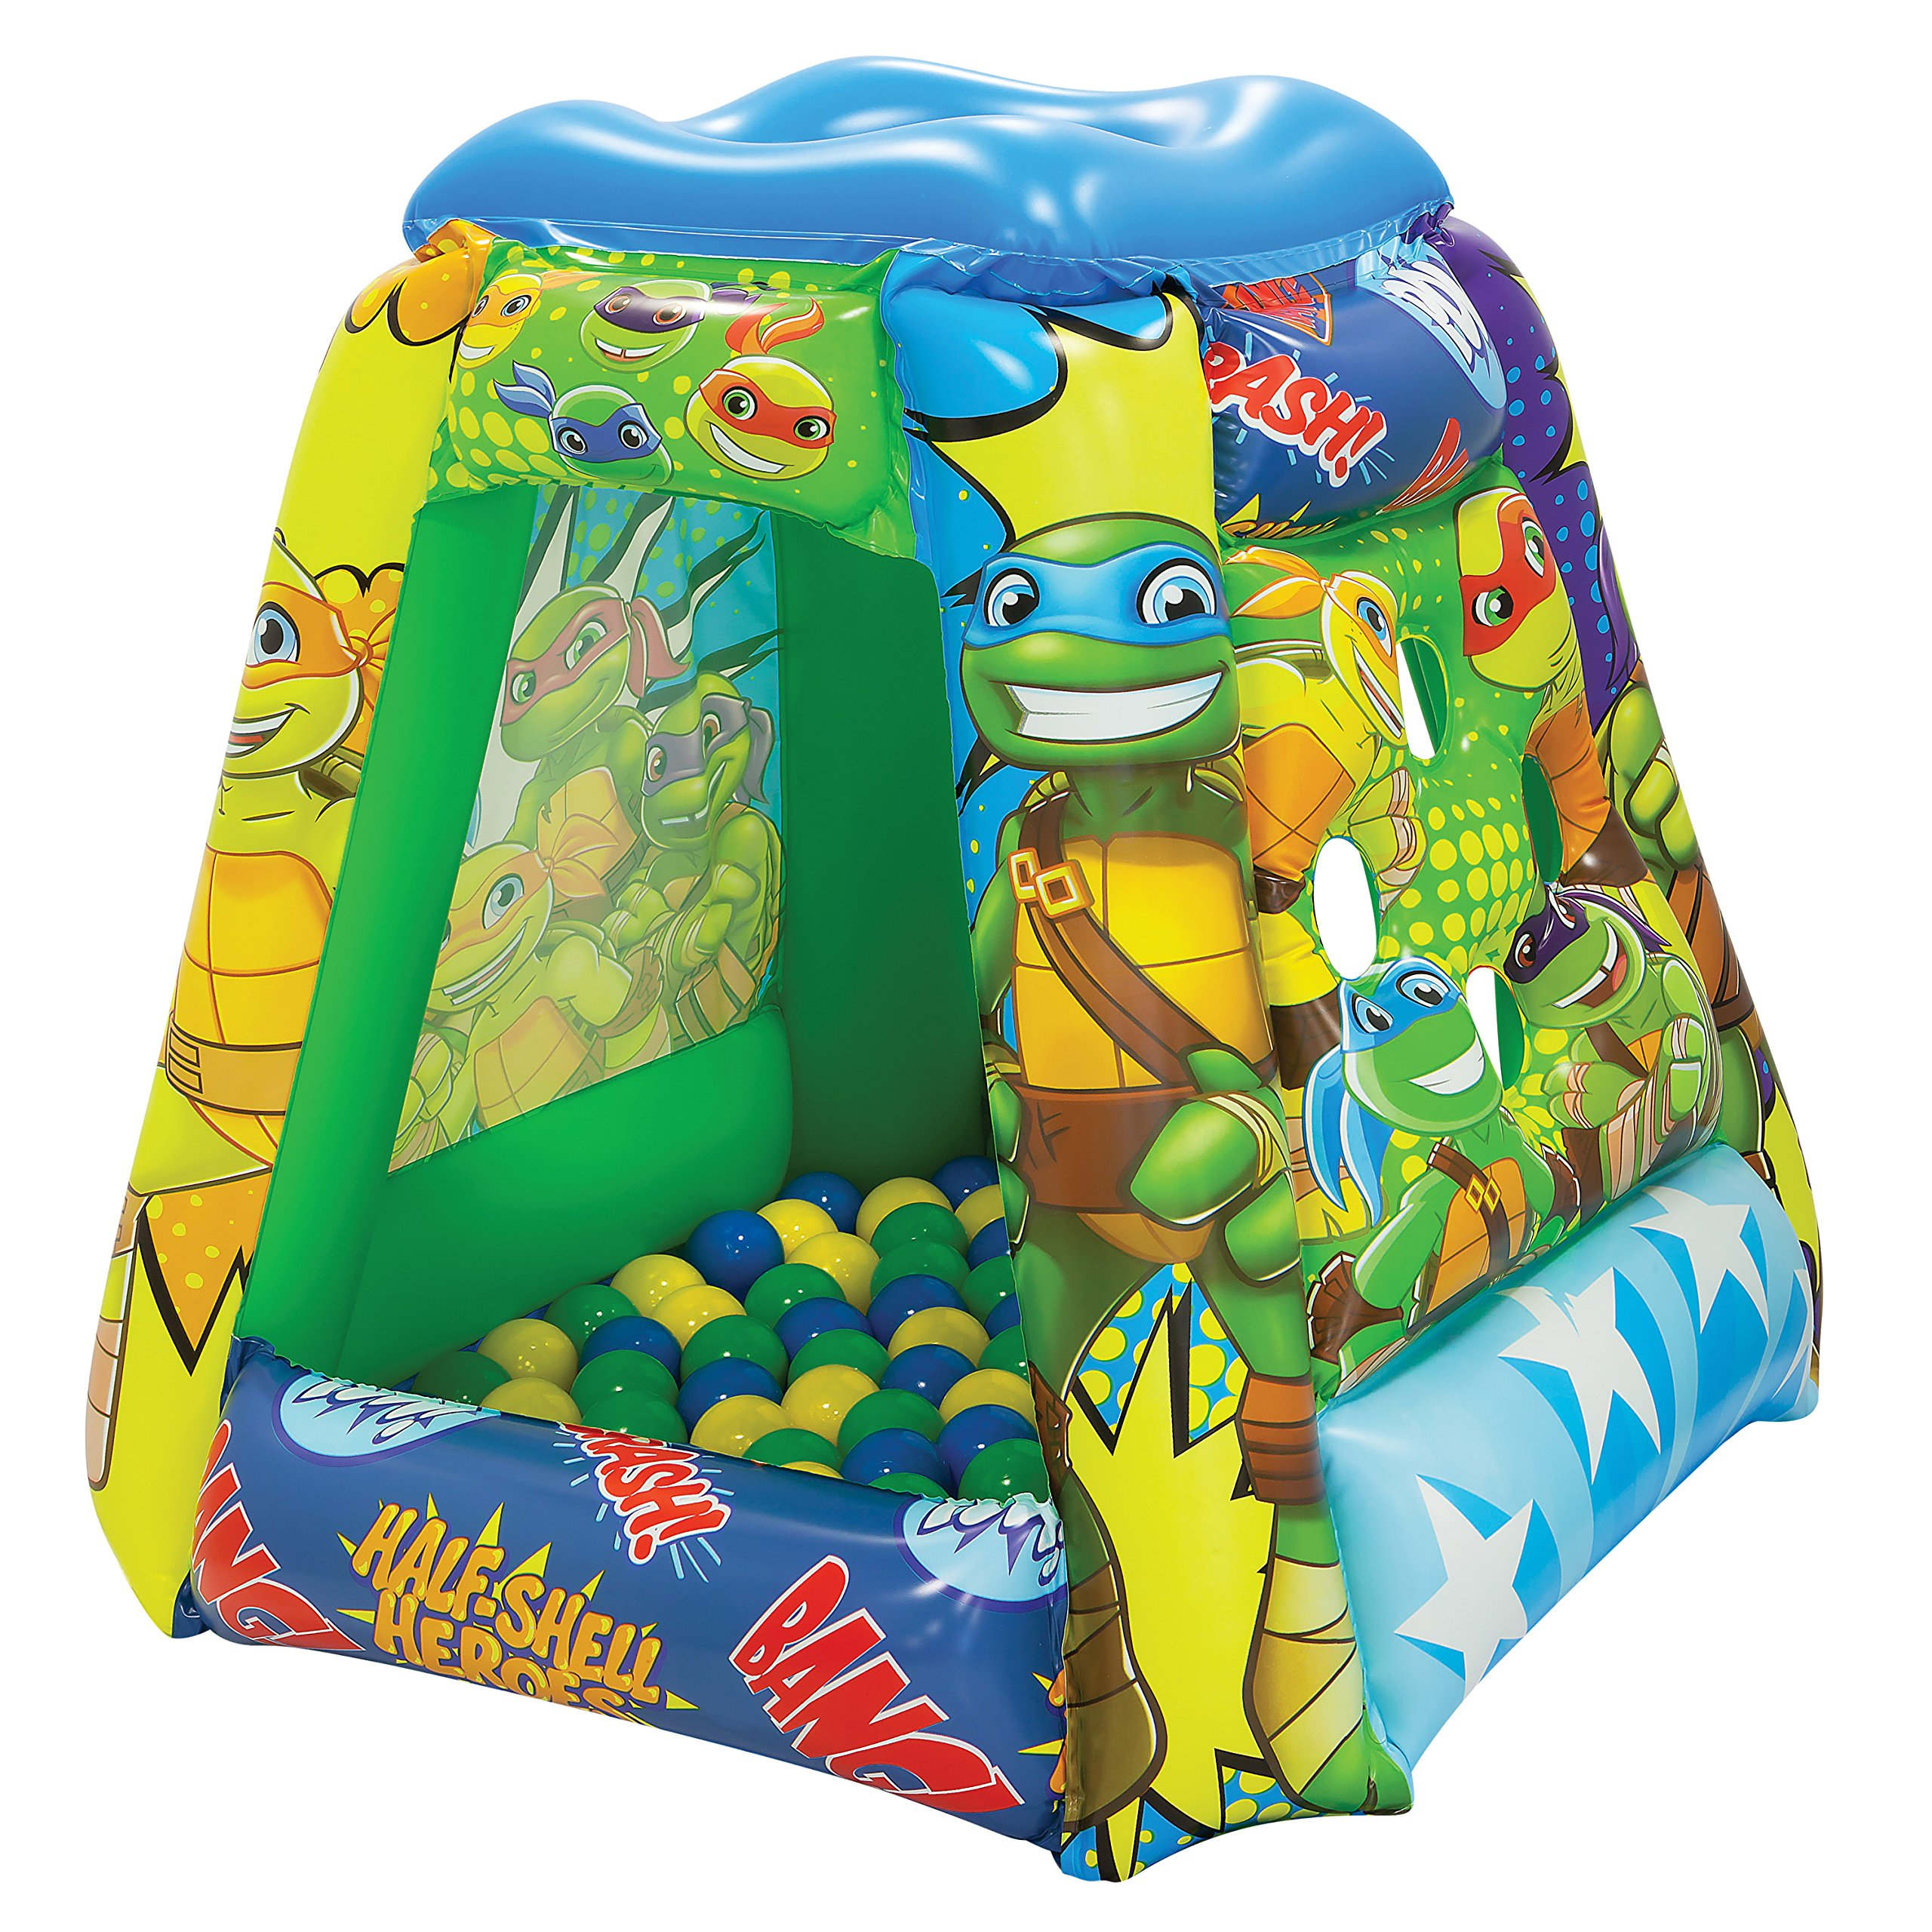 Teenage Mutant Ninja Turtles Half-Shell Heroes Ball Pit, 1 Inflatable & 20 Sof-Flex Balls, Green, 37'' W x 37'' D x 34'' H